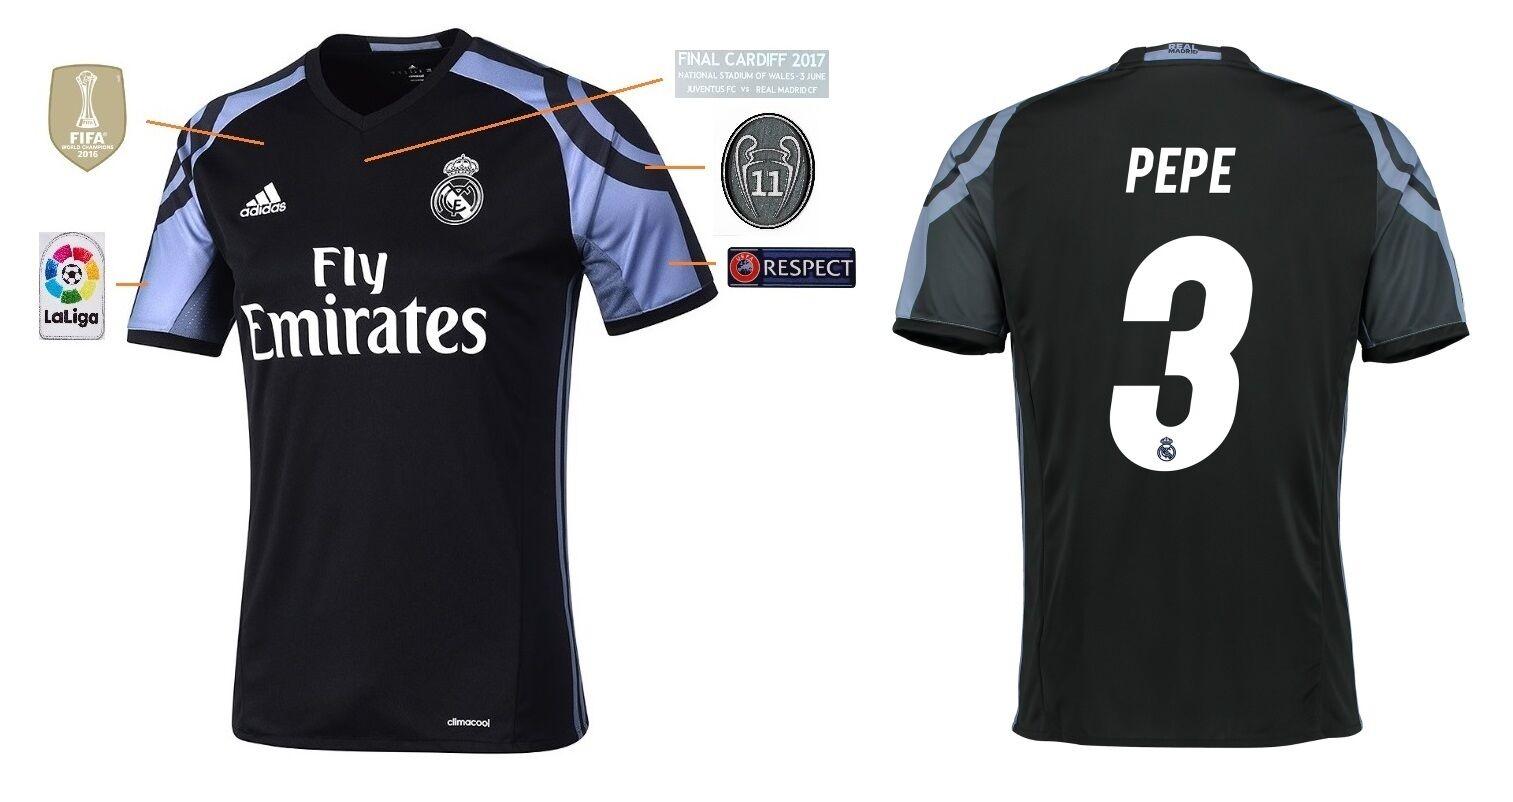 Trikot Real Madrid Third Champions League Final Cardiff 2017 - Pepe